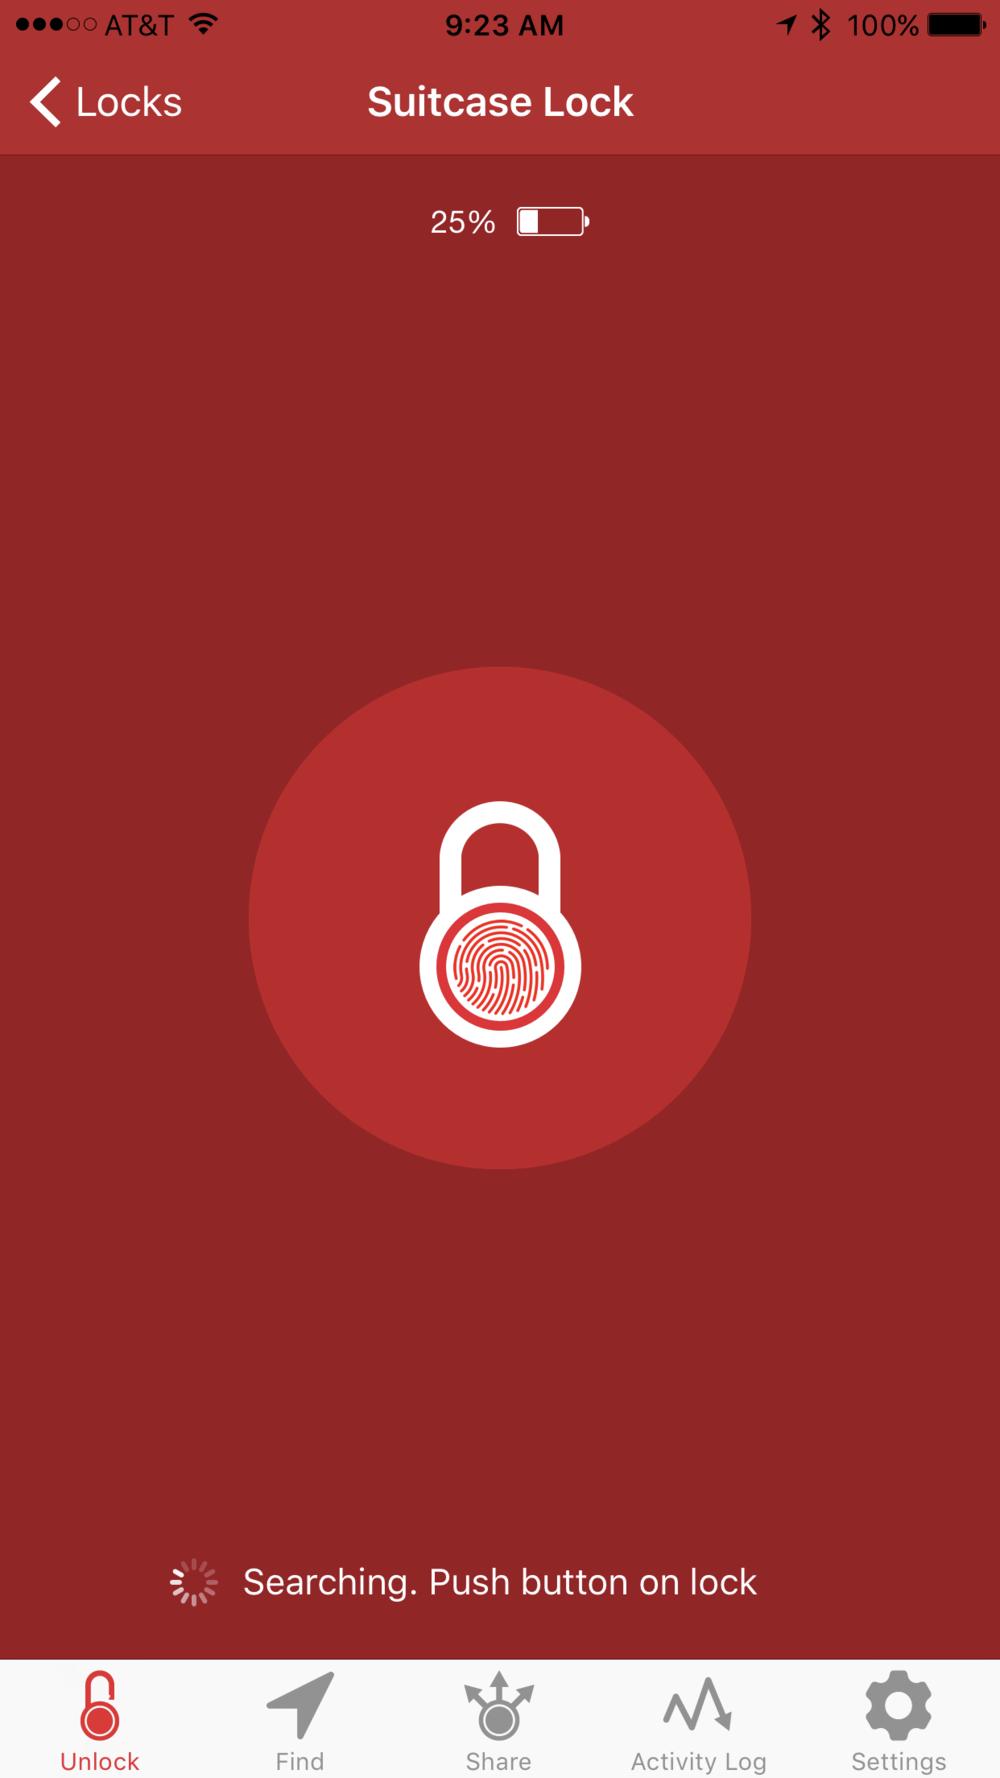 App requests a button push